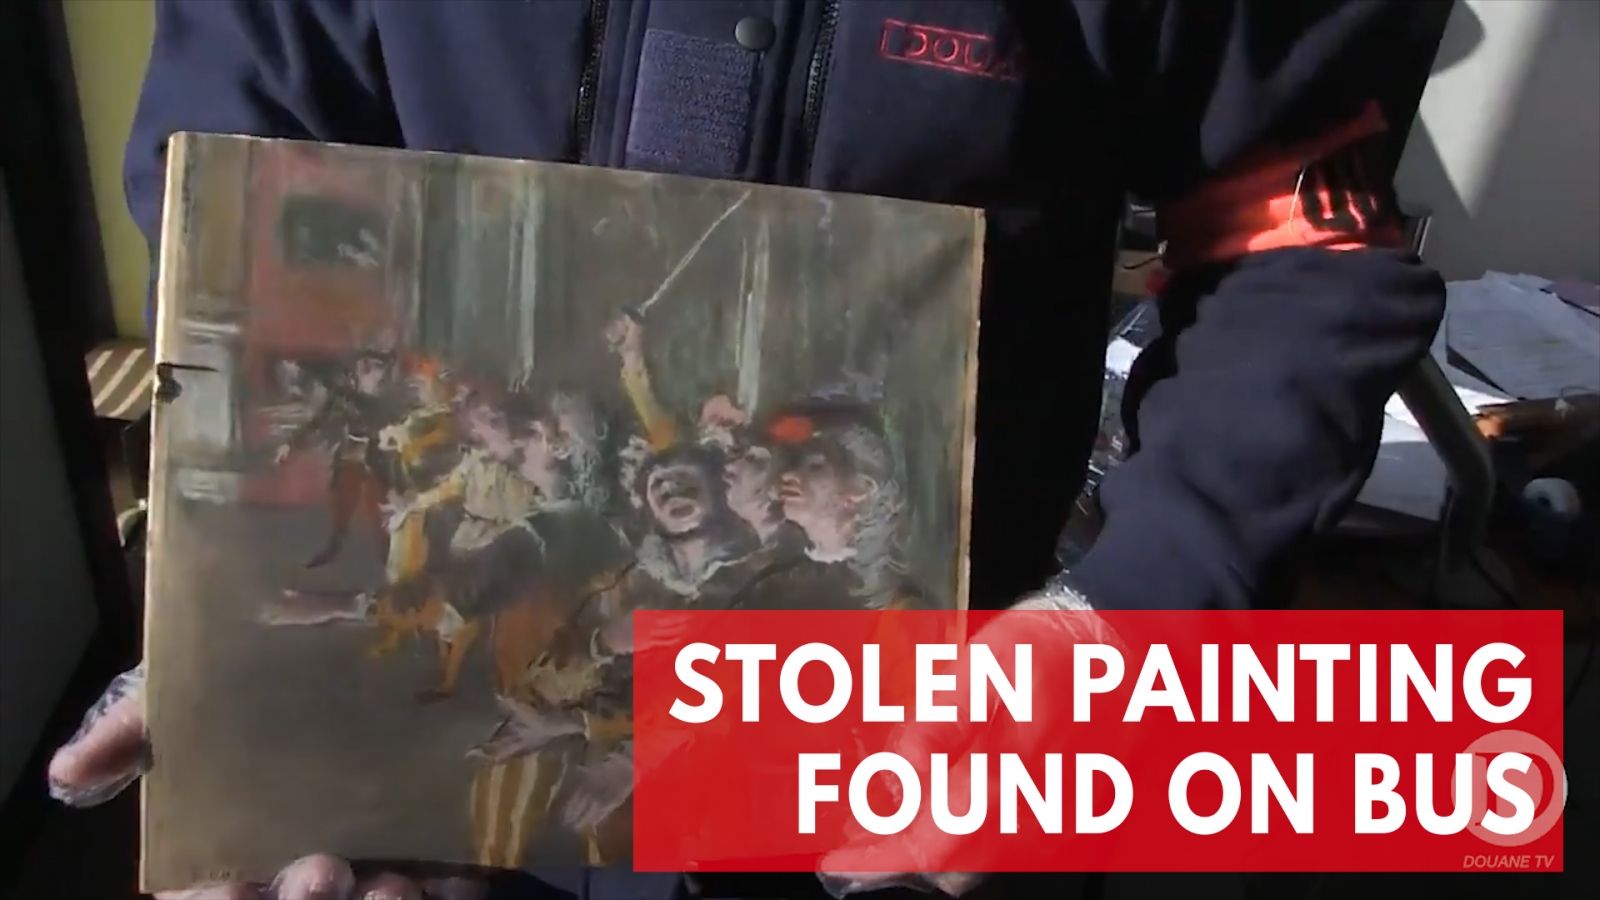 stolen-degas-painting-found-on-bus-near-paris